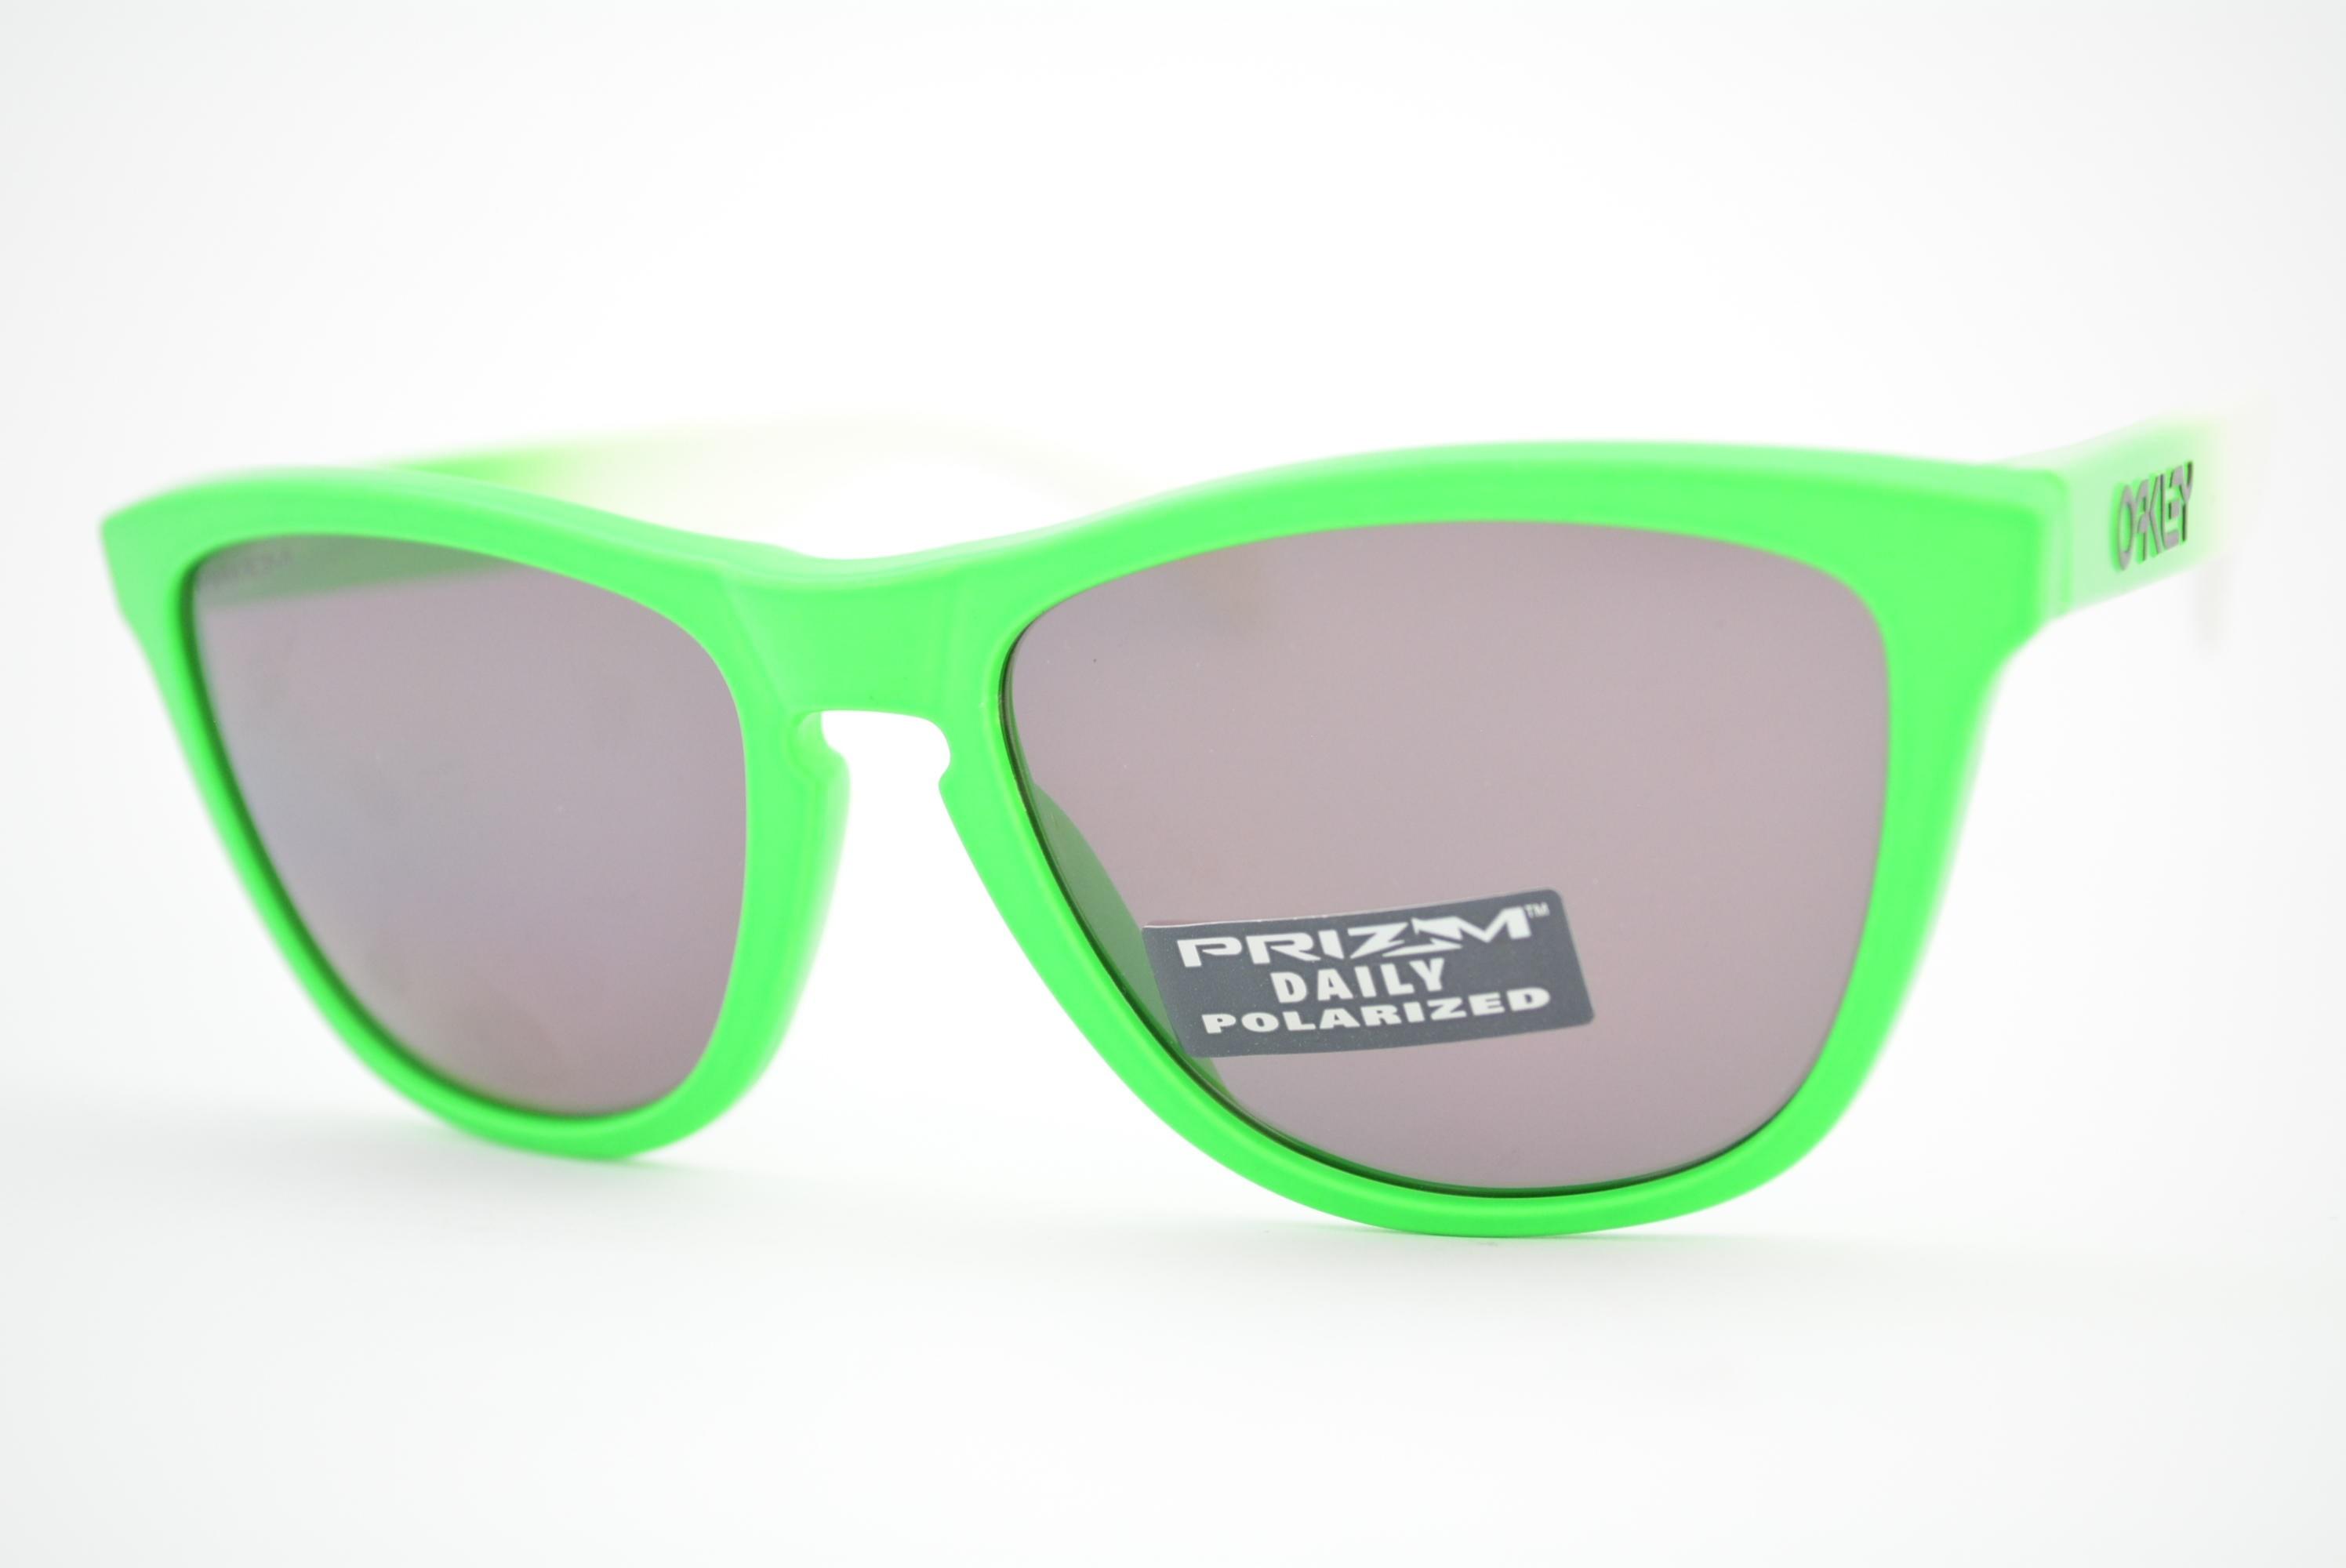 da13ace8e9517 óculos de sol Oakley mod Frogskins green fade w prizm daily polarized